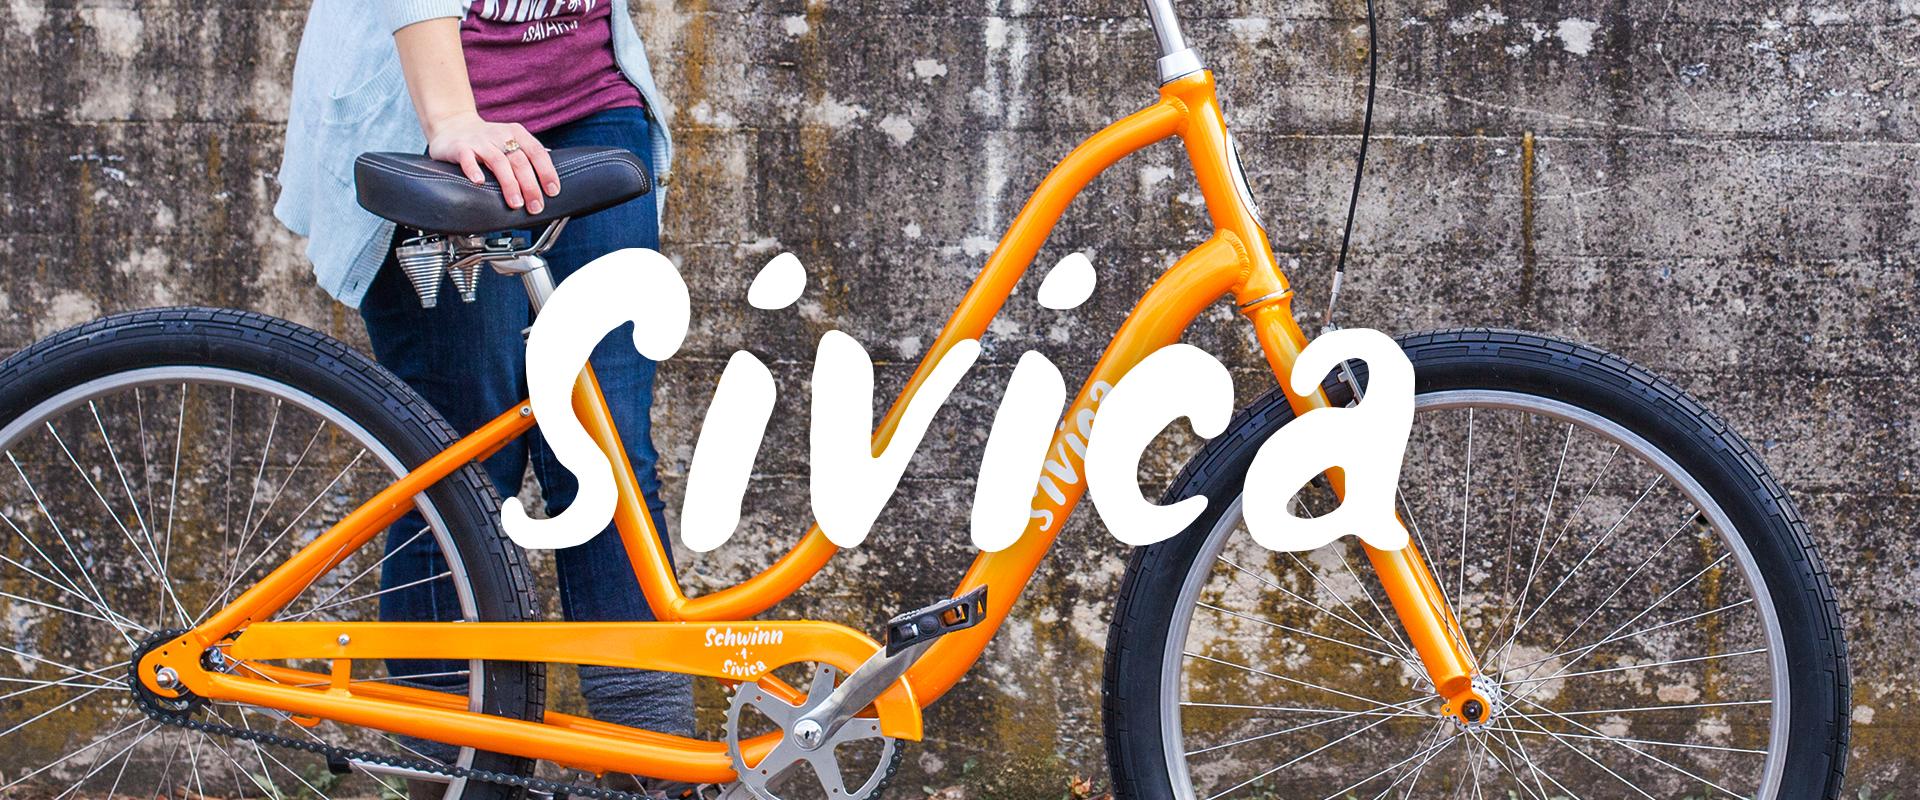 Sivica_Hero-3.jpg